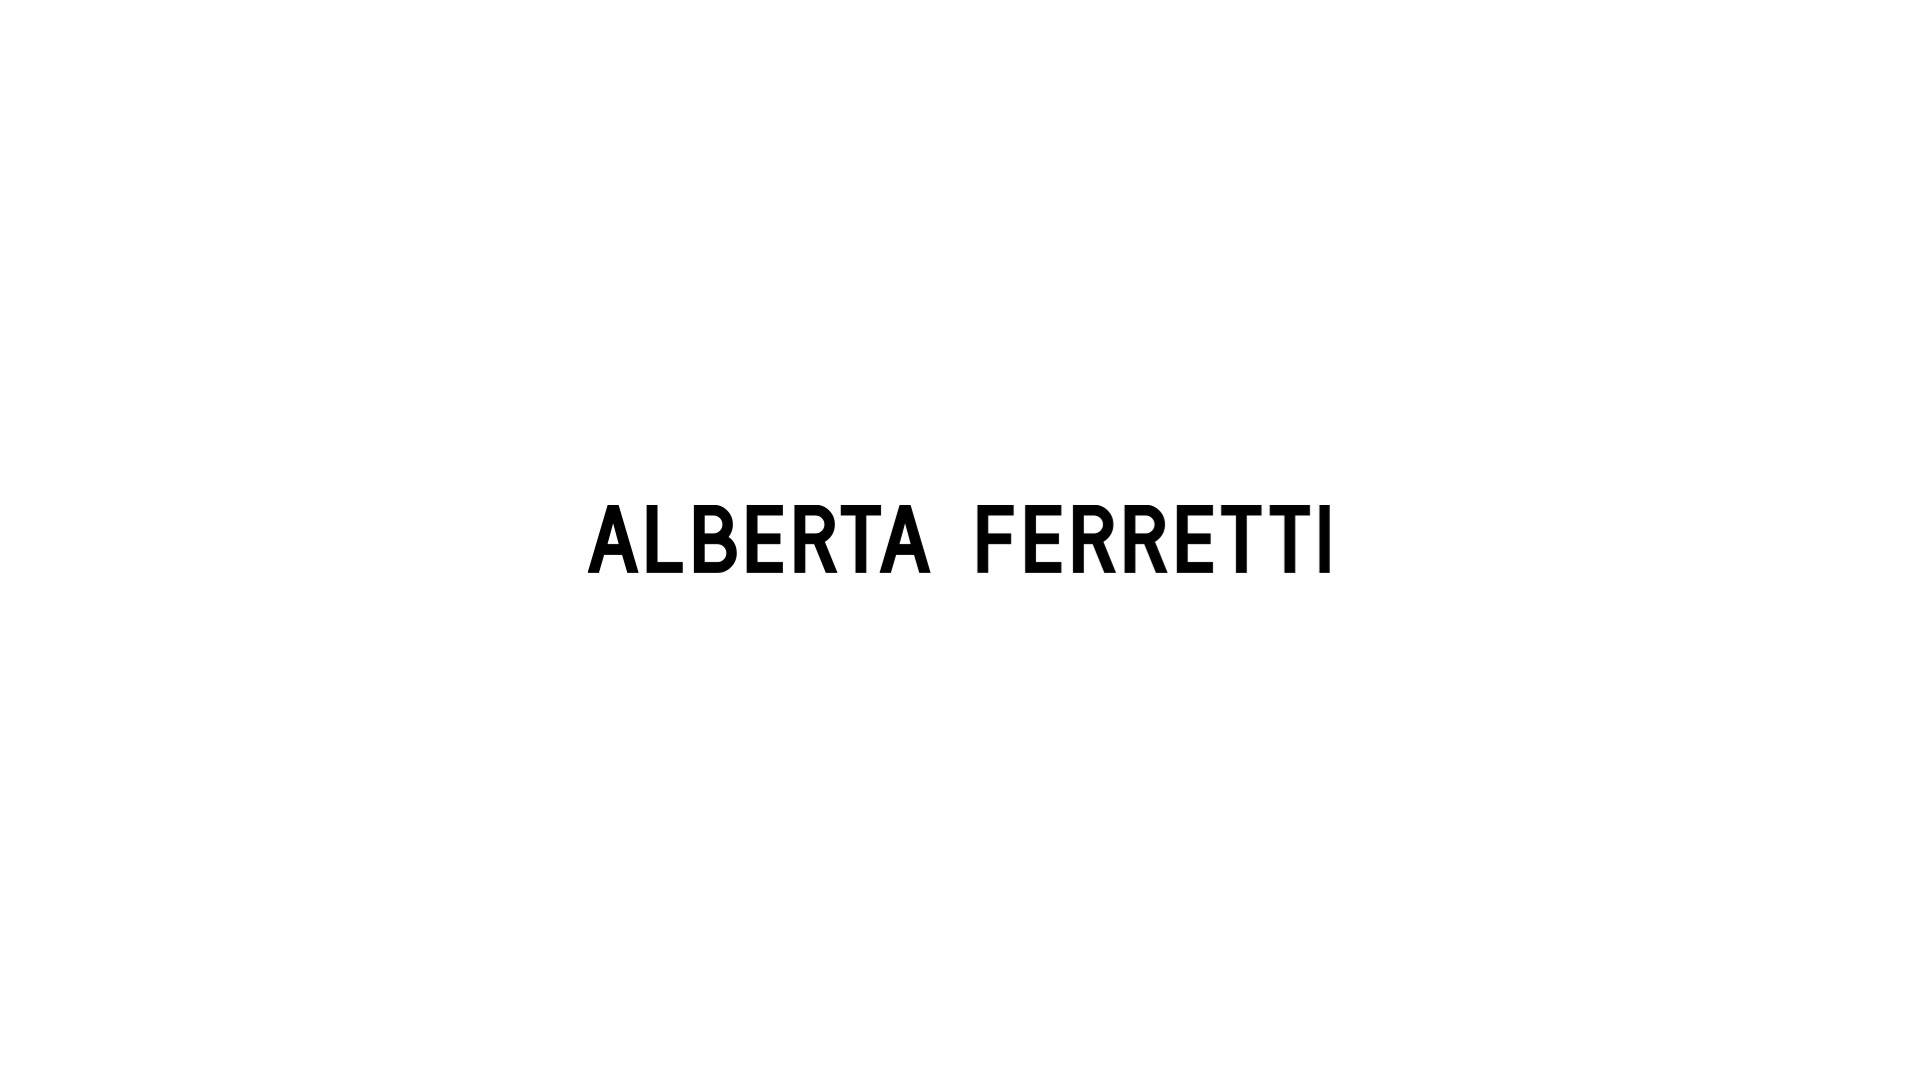 Alberta Ferretti Spring Summer 2016 Women's Runway Show Live Streaming September 23rd